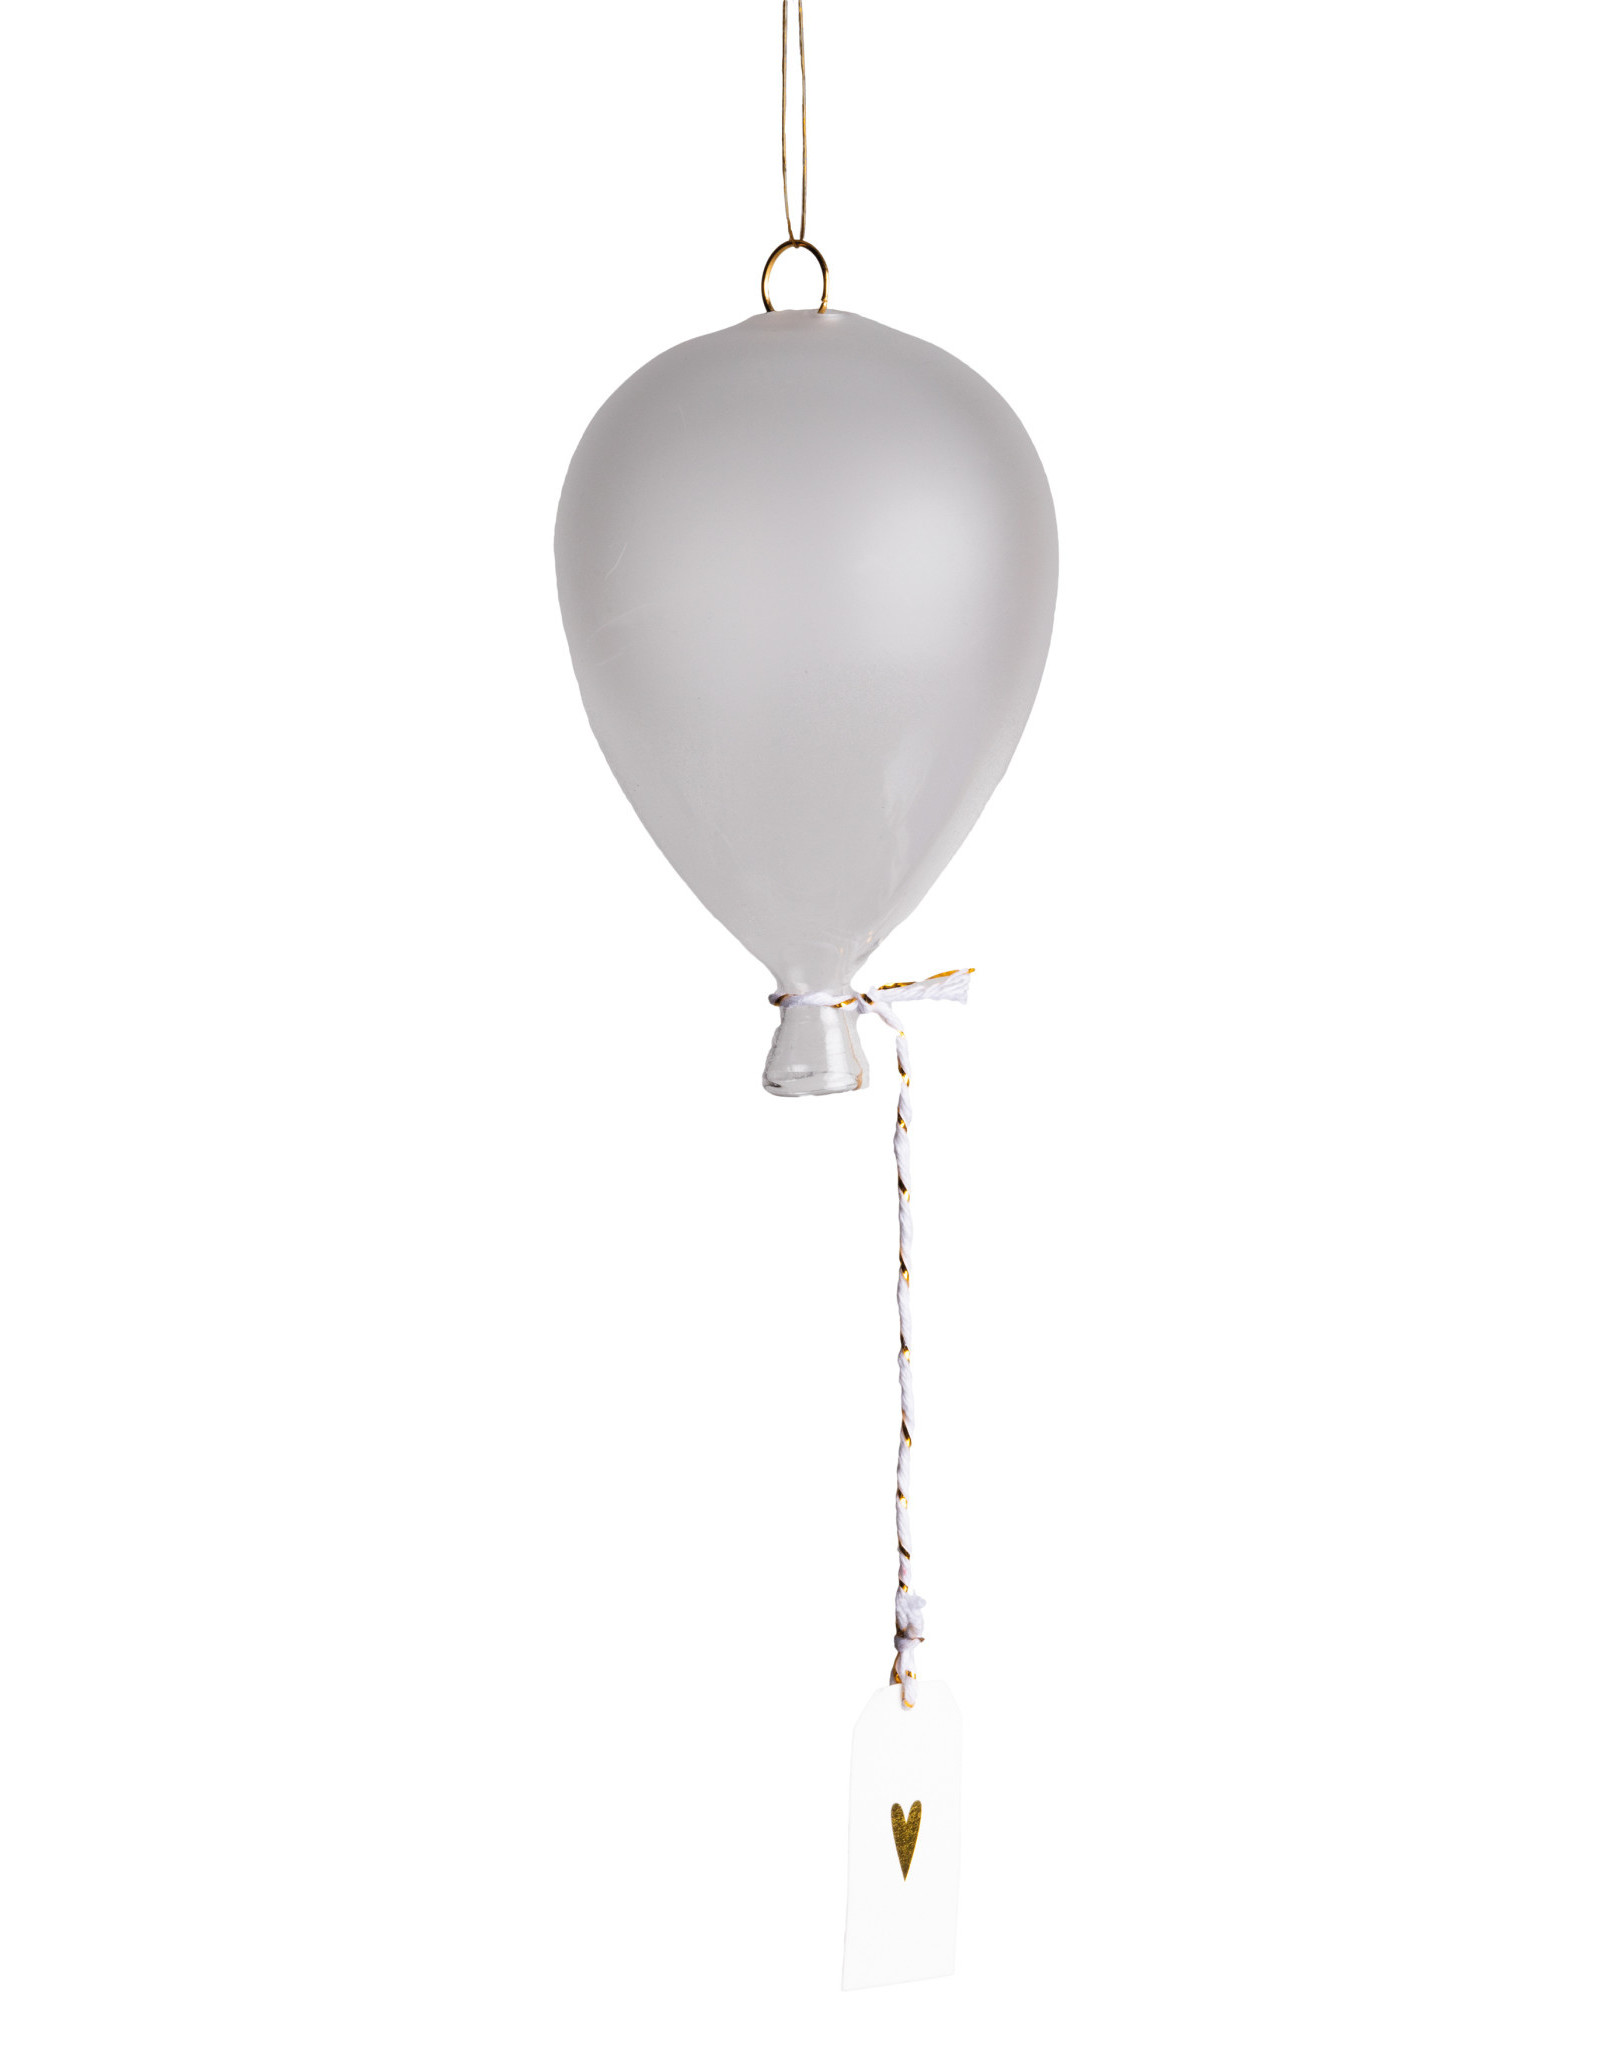 Raeder Balloon Heart white